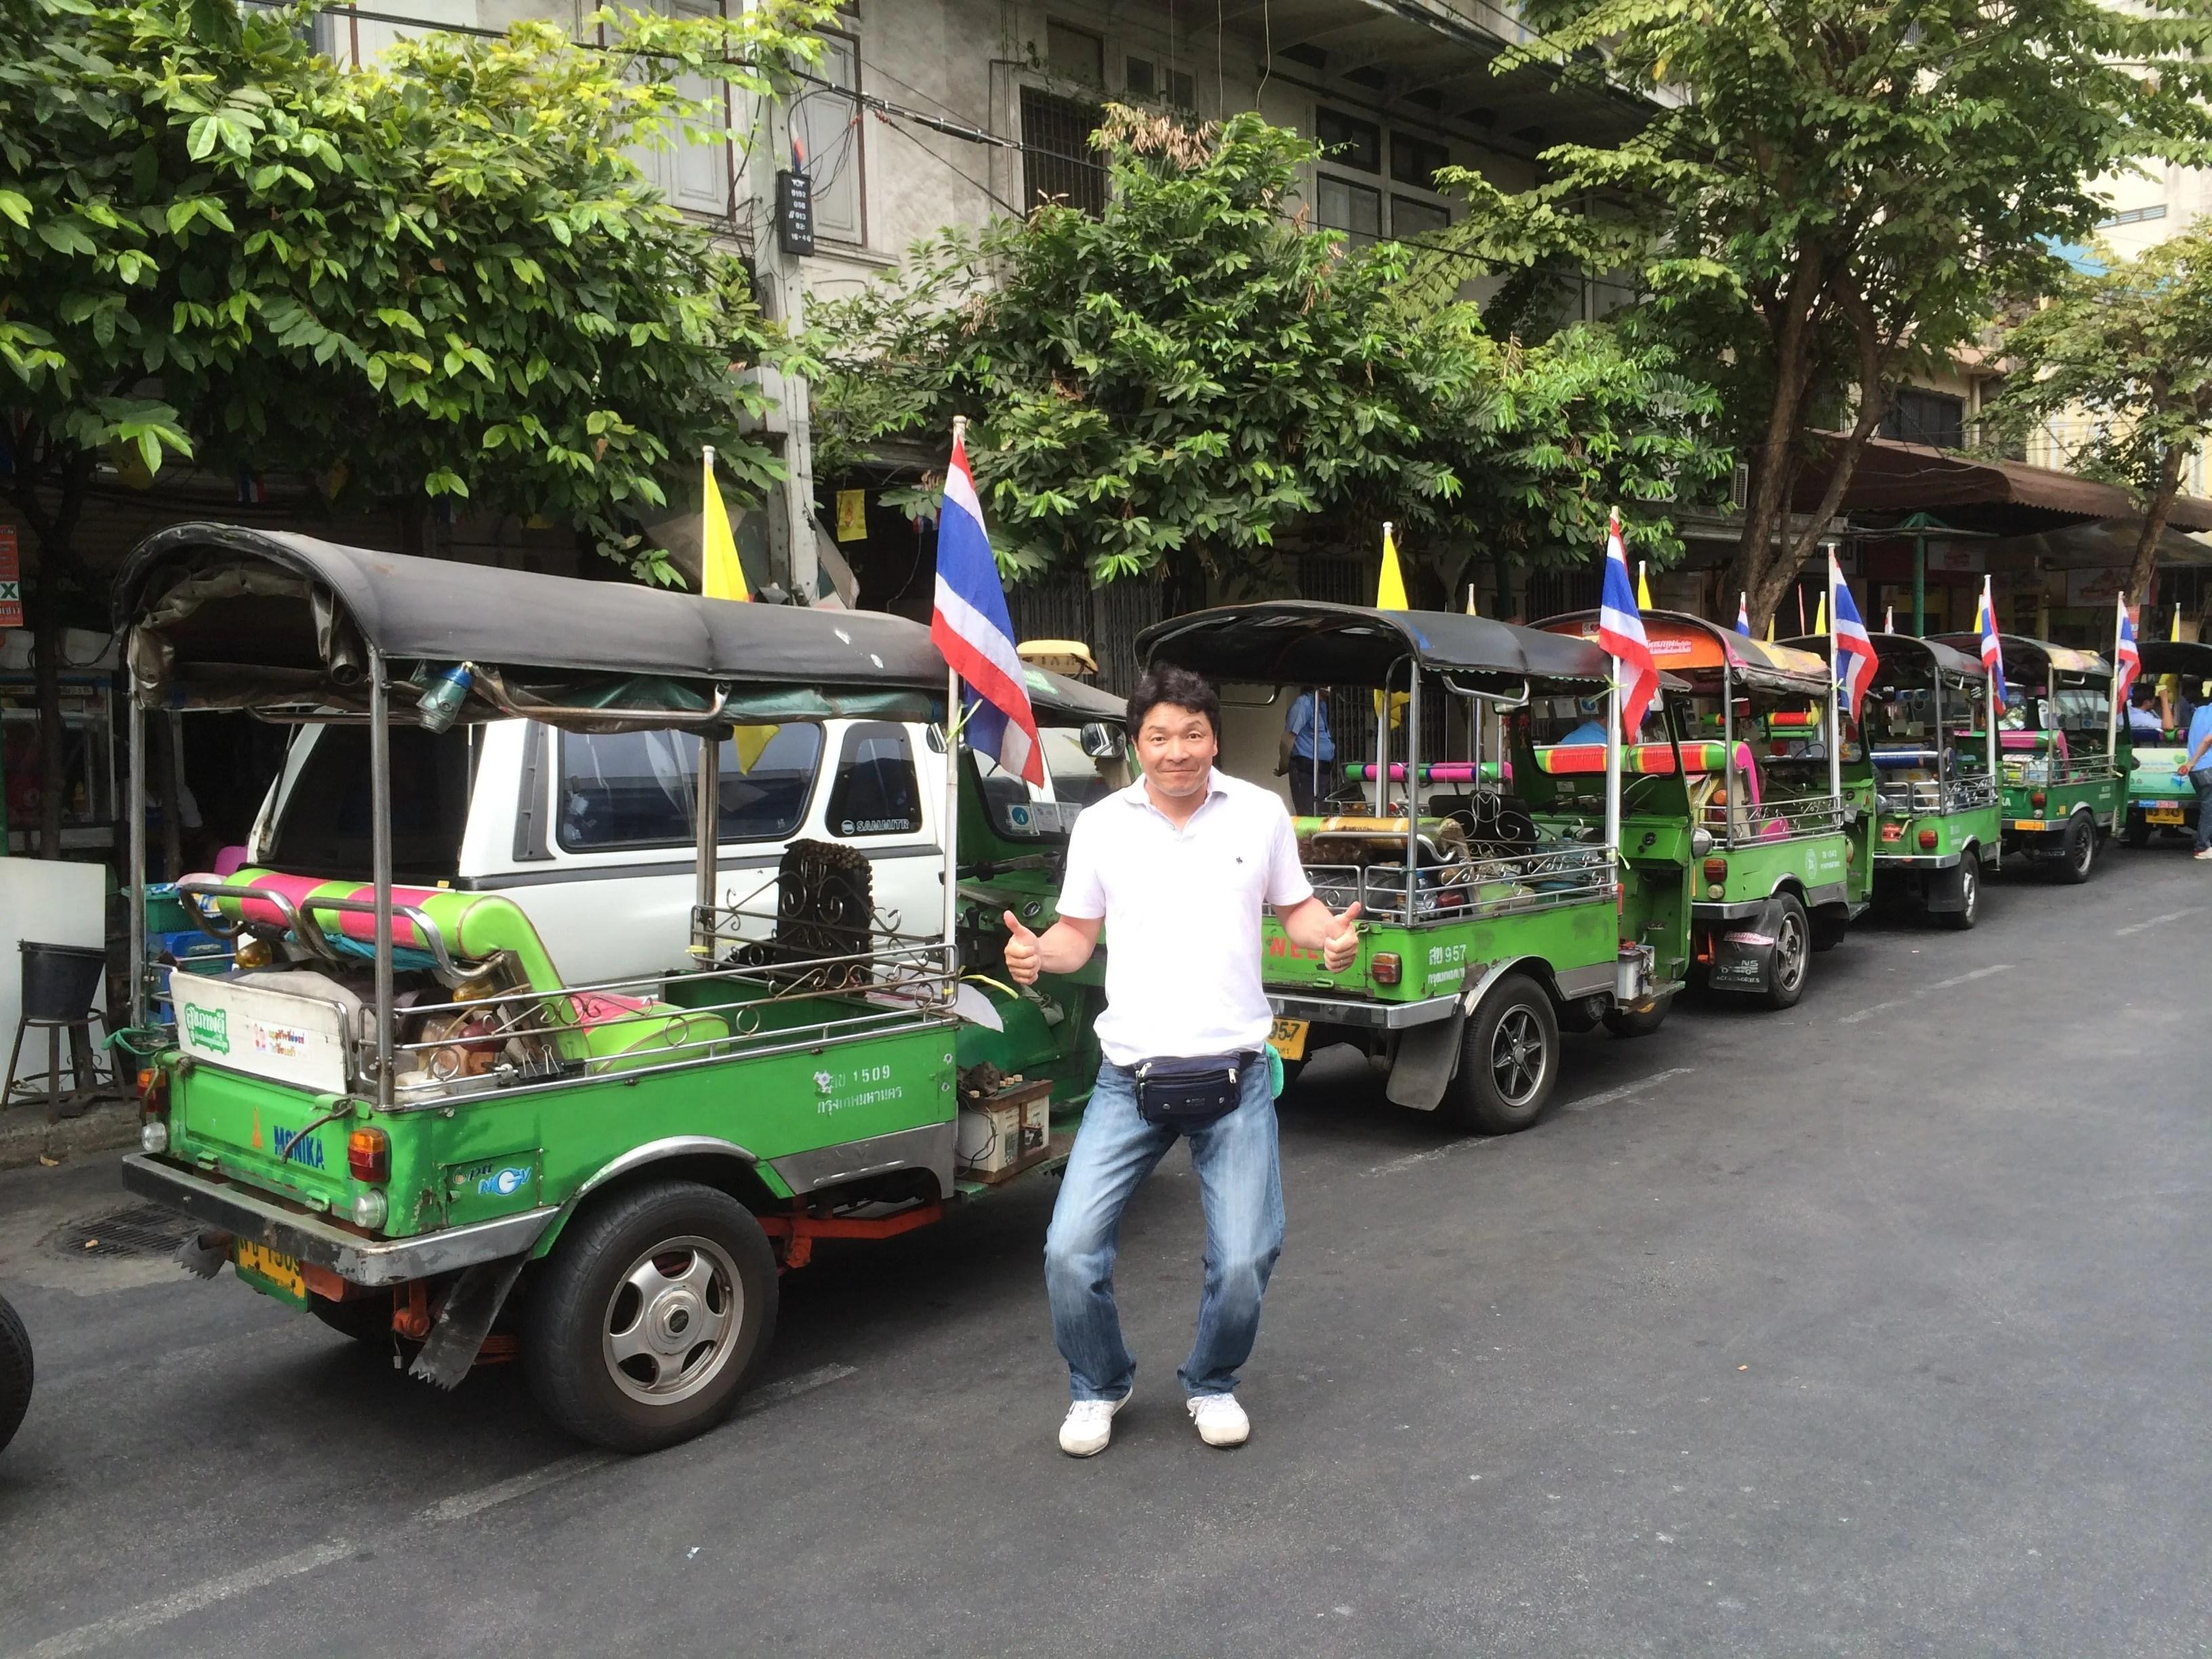 20150505_b_s_Thailand1